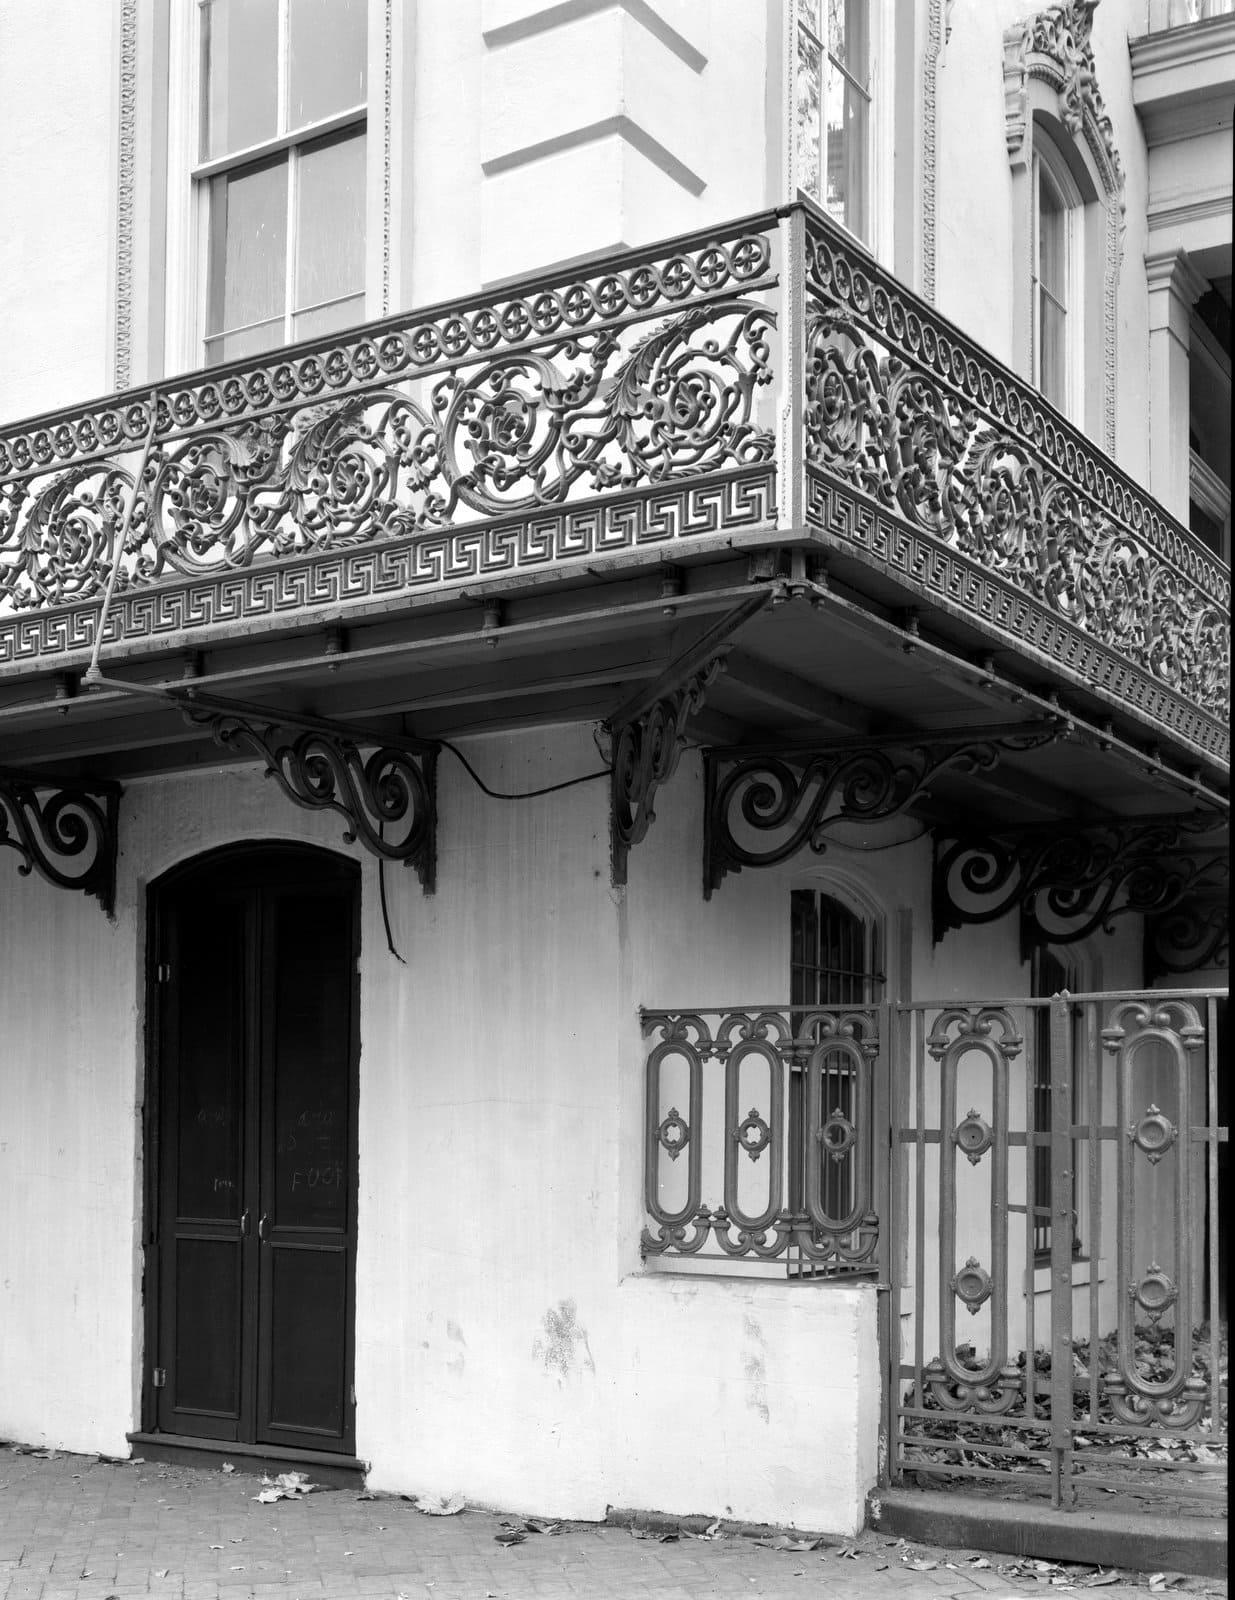 Ironwork balcony at the Hardee-Hartridge House, Savannah - 1930s